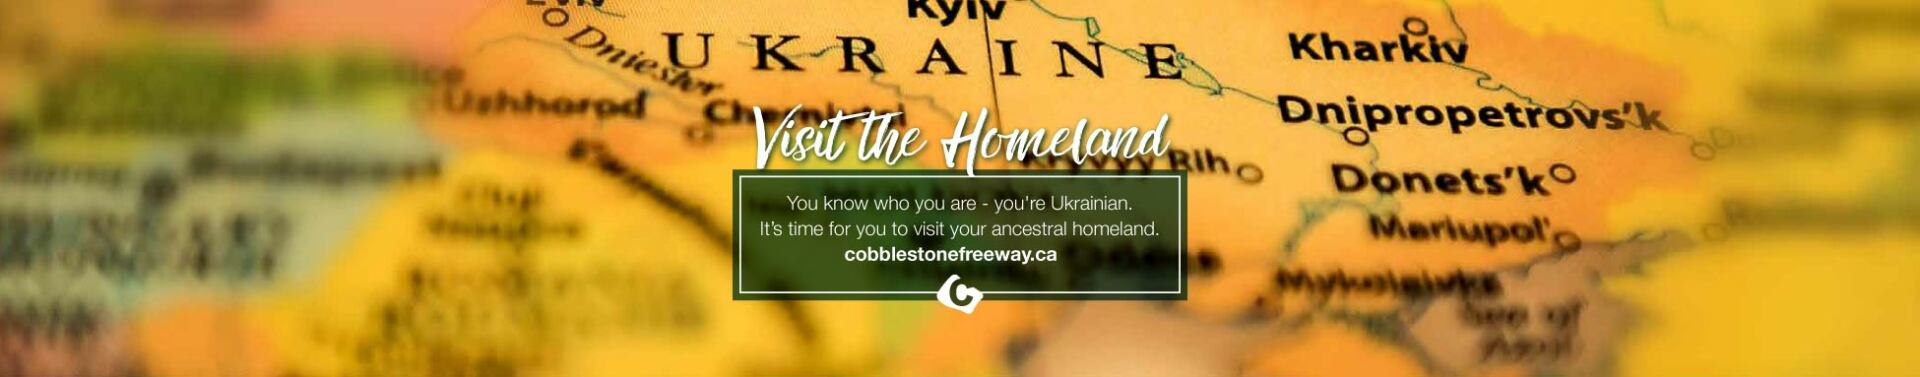 Visit the Homeland